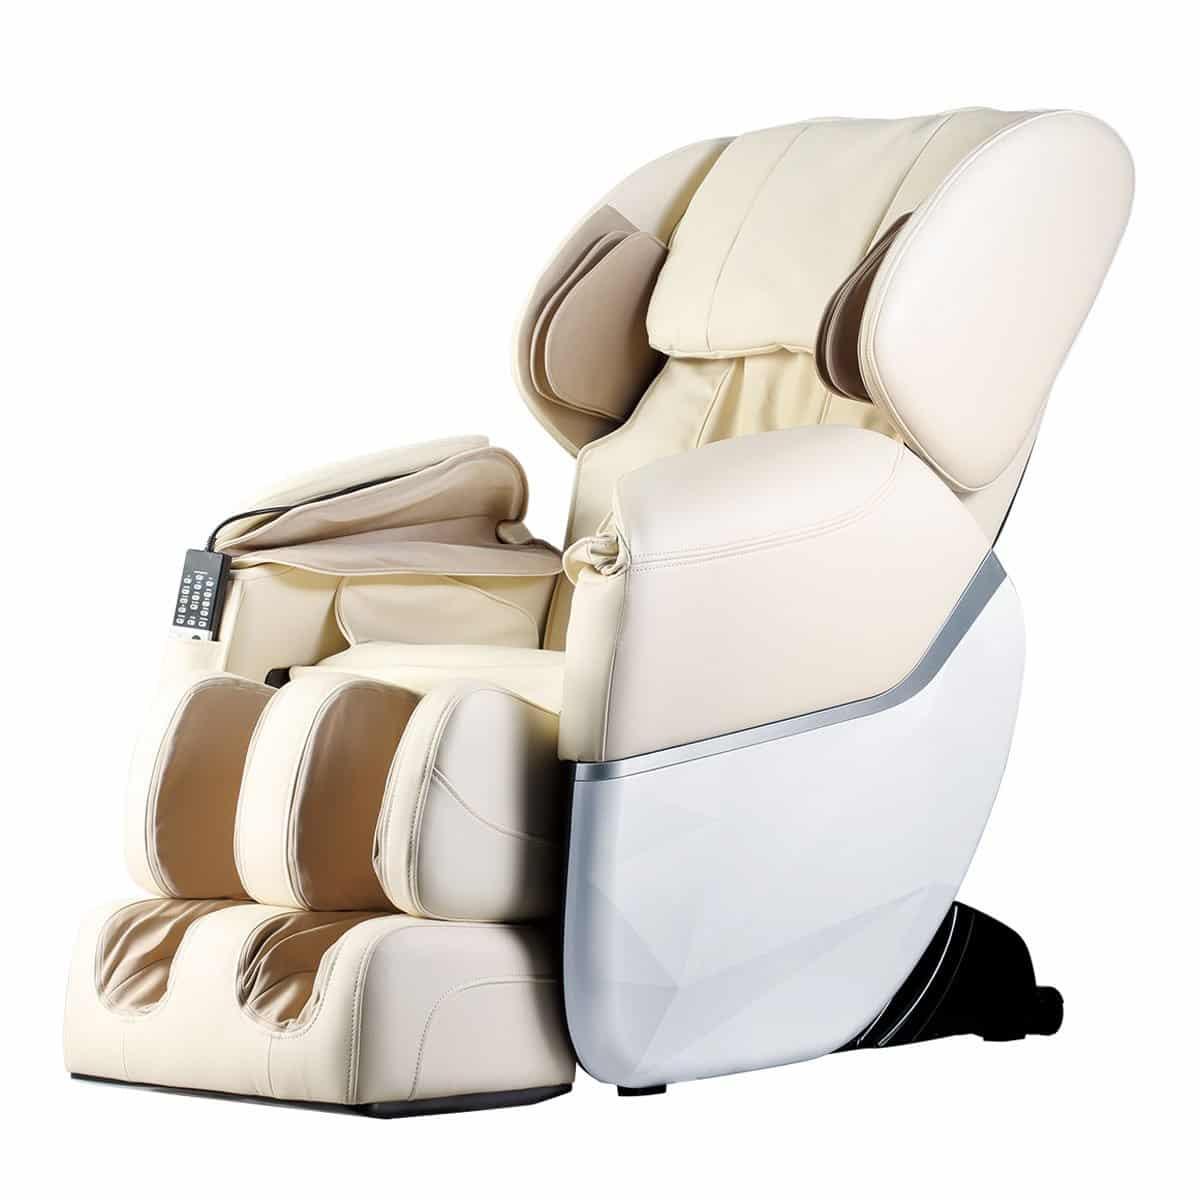 Mr. Direct full-body Shiatsu Massage Chair